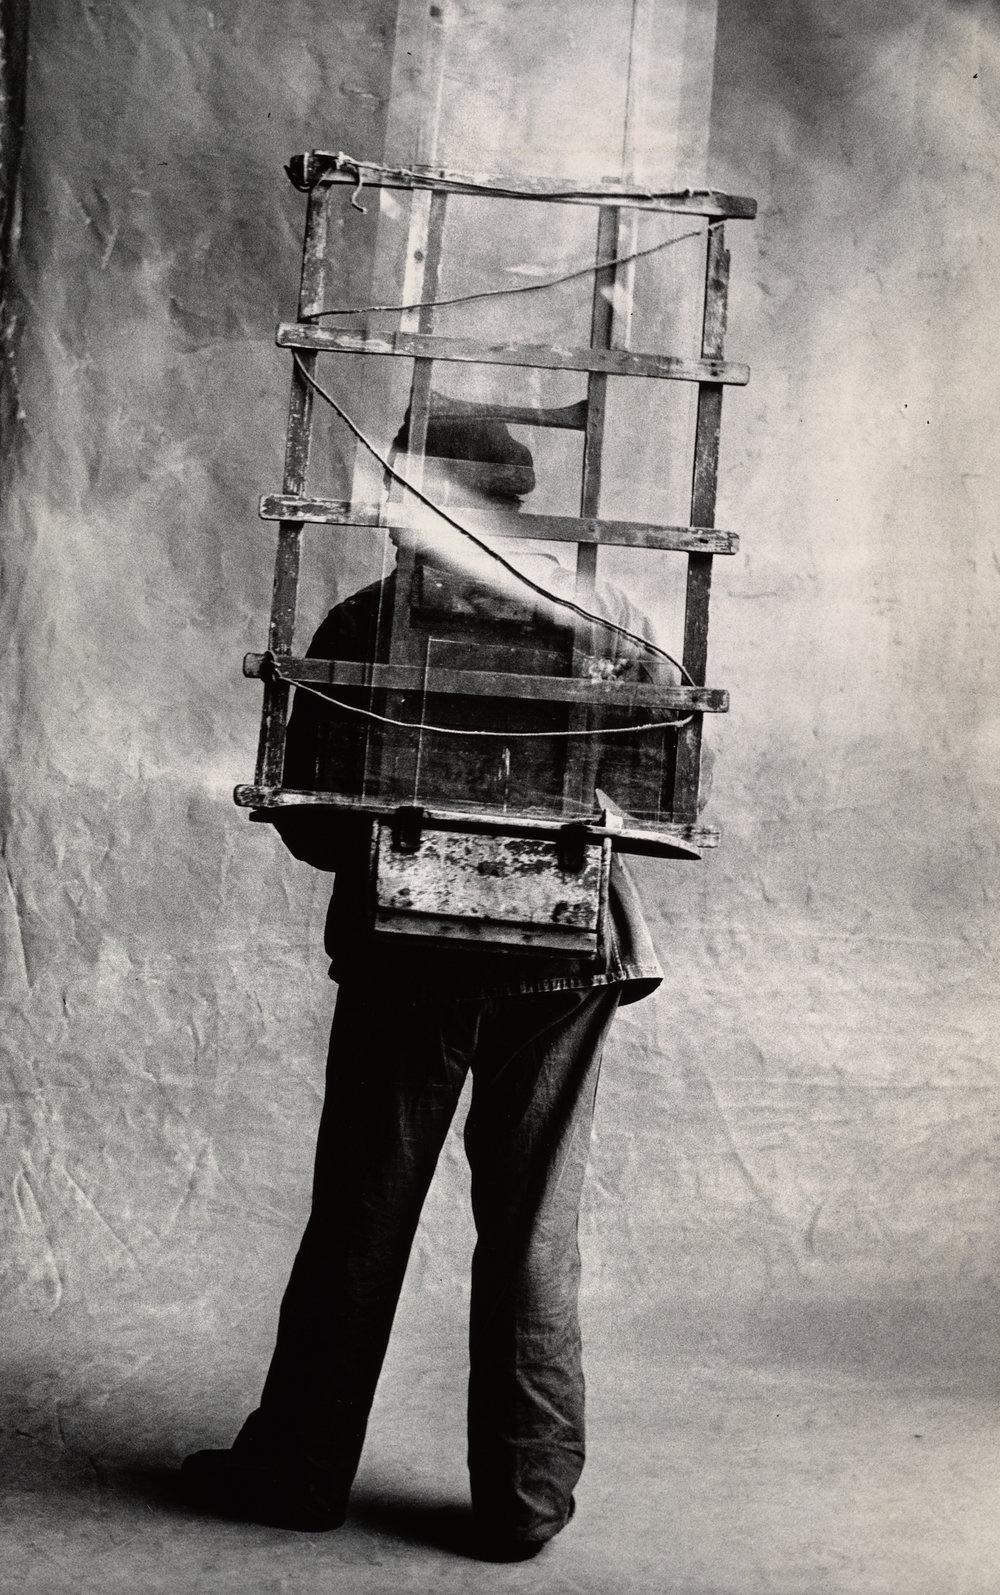 Vitrier , Paris, 1950 [Glazier] Gelatin silver print © Condé Nast (Fr.)